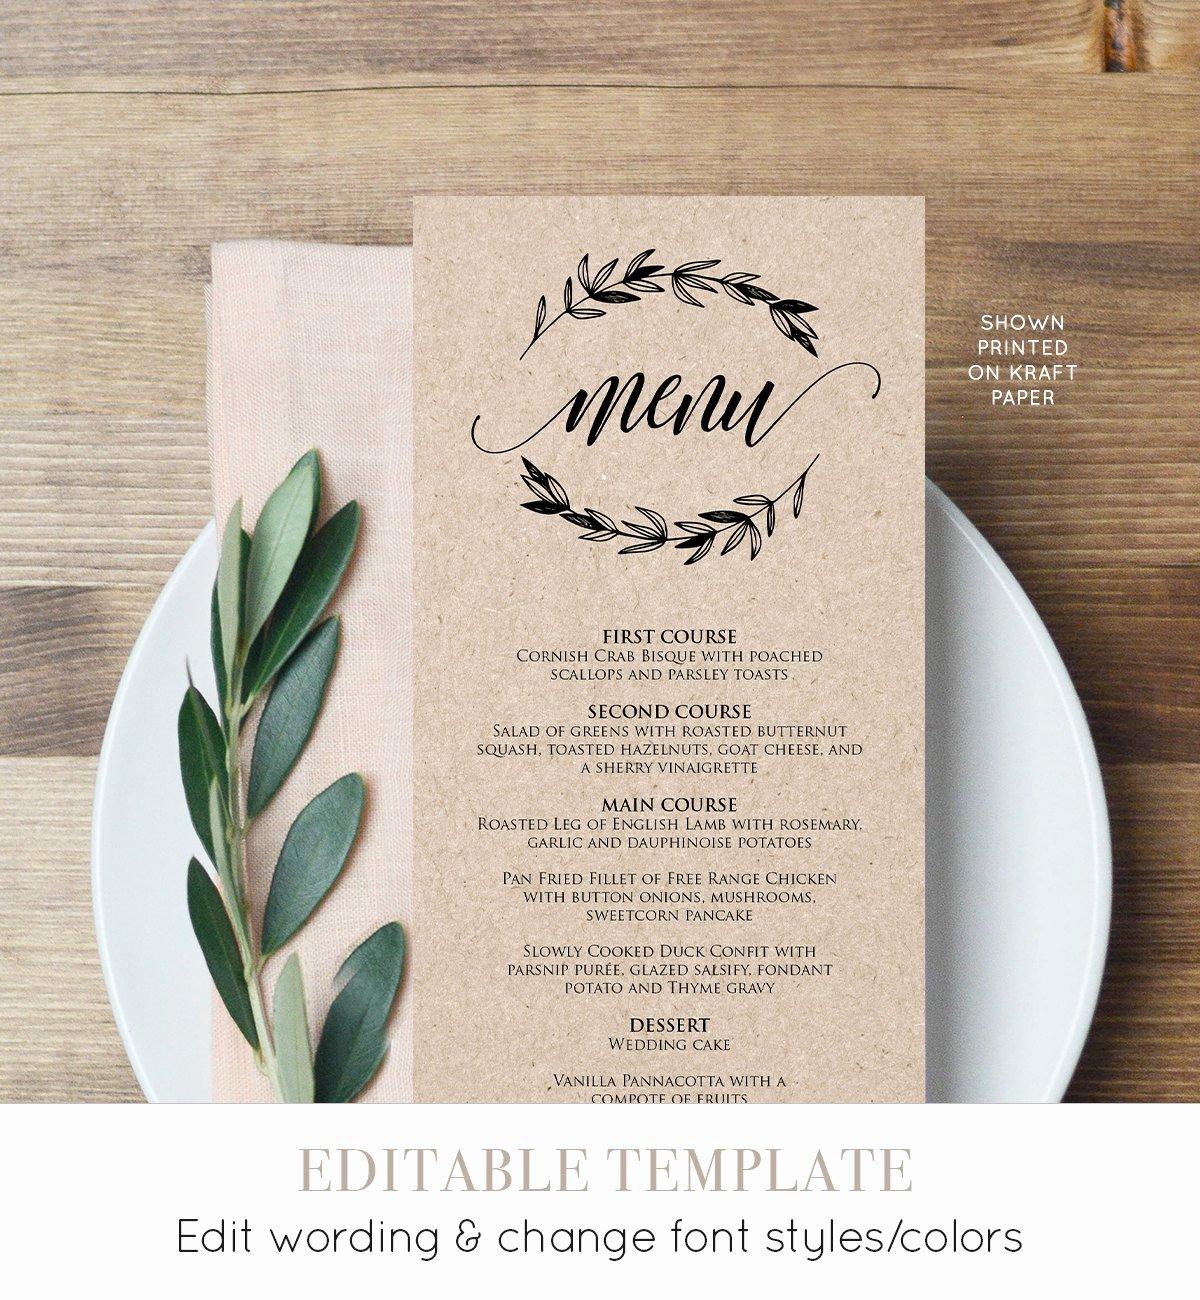 Diy Wedding Menu Template New Rustic Wedding Menu Template Printable Menu Card